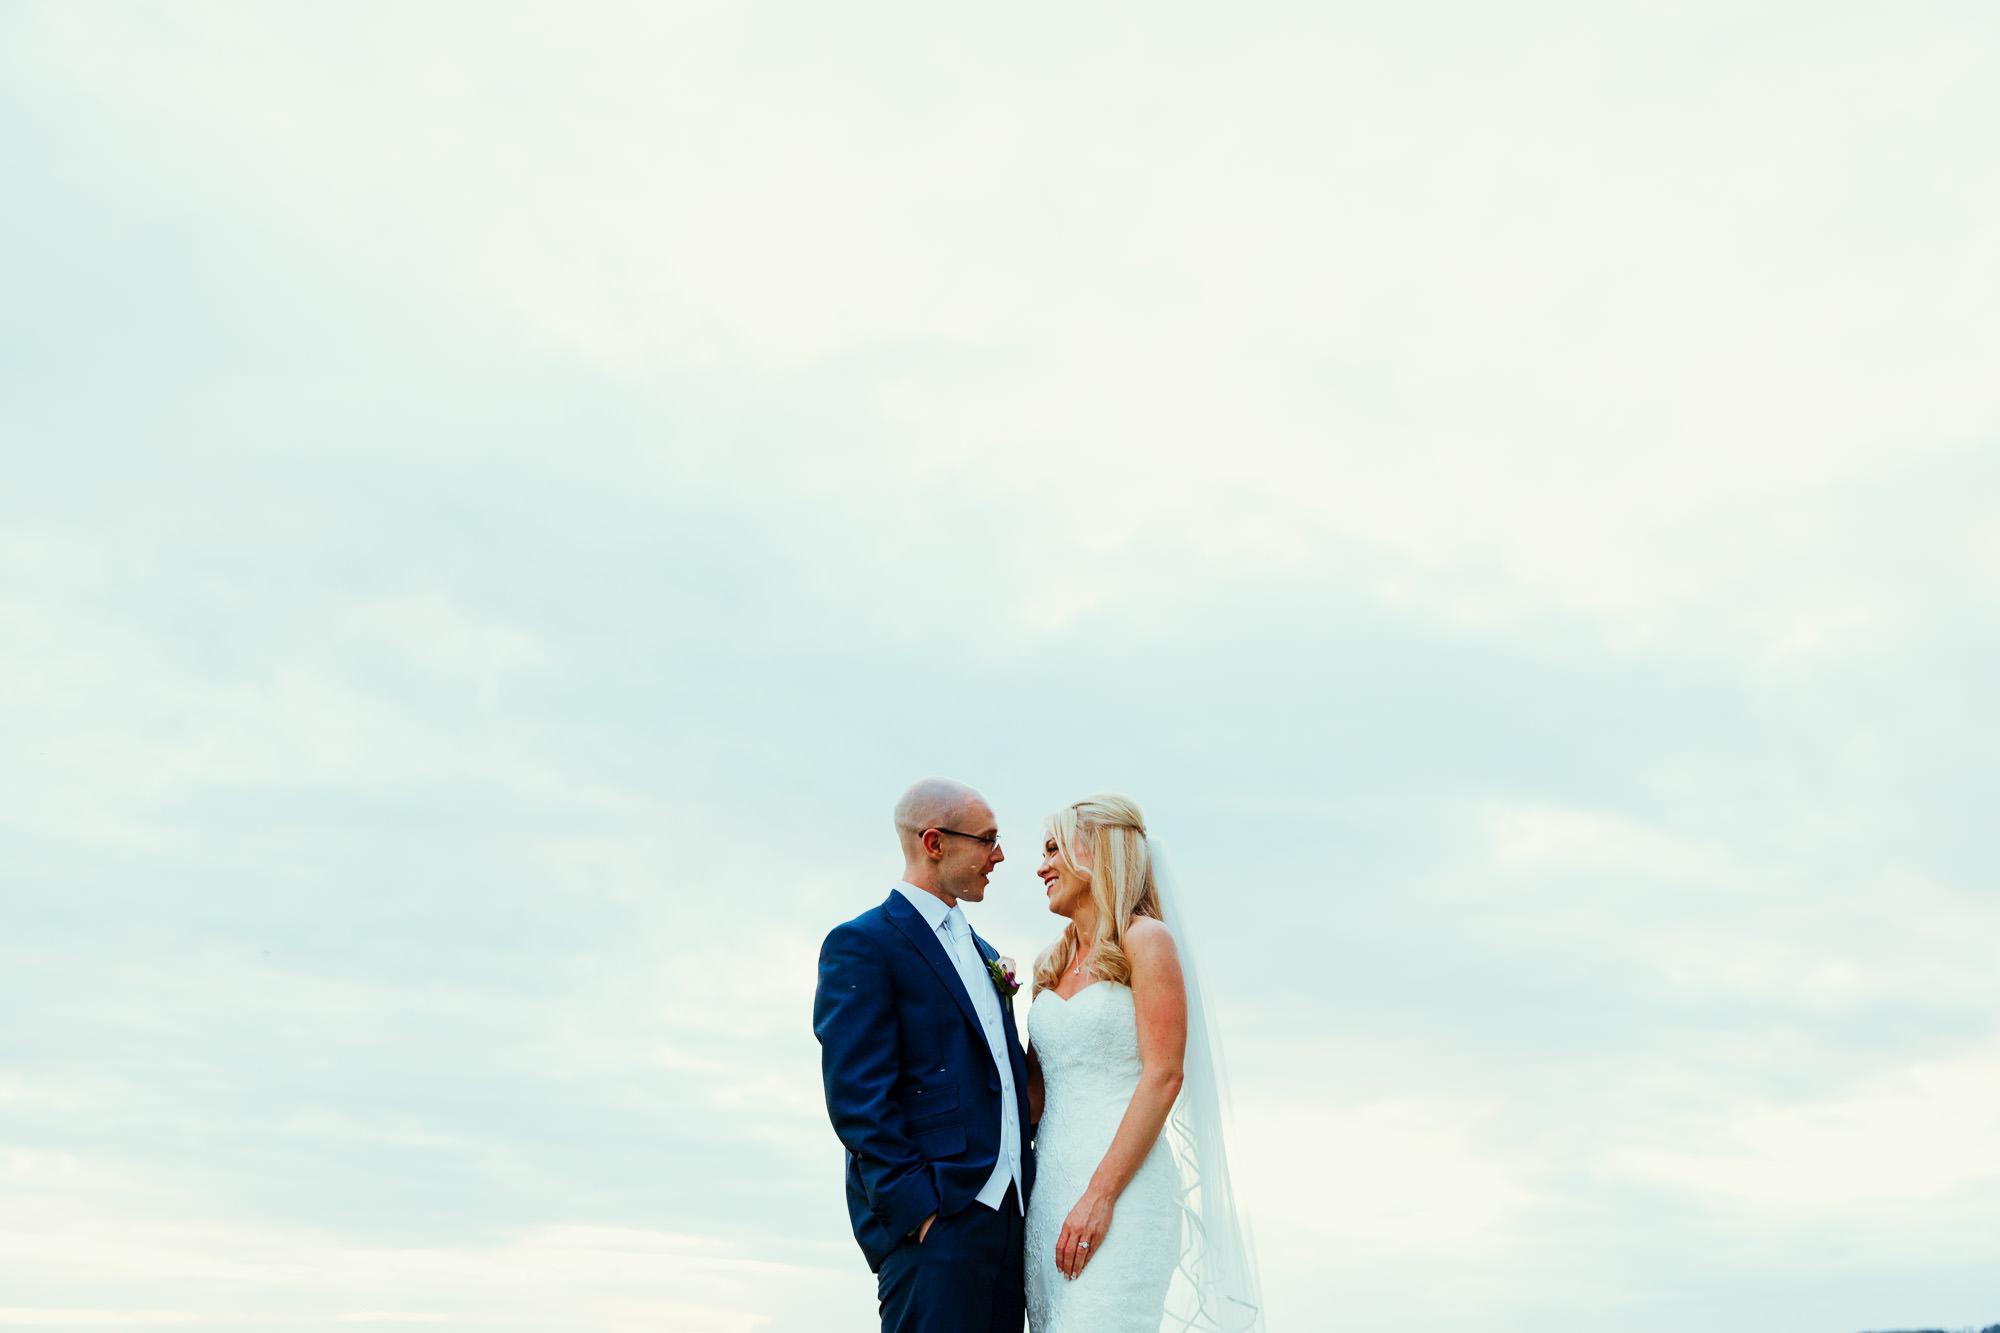 CLAIREBYRNEPHOTOGRAPHY-WEDDING-Ireland-tulffaris-alternative-fun-Lisa-terry-41.jpg